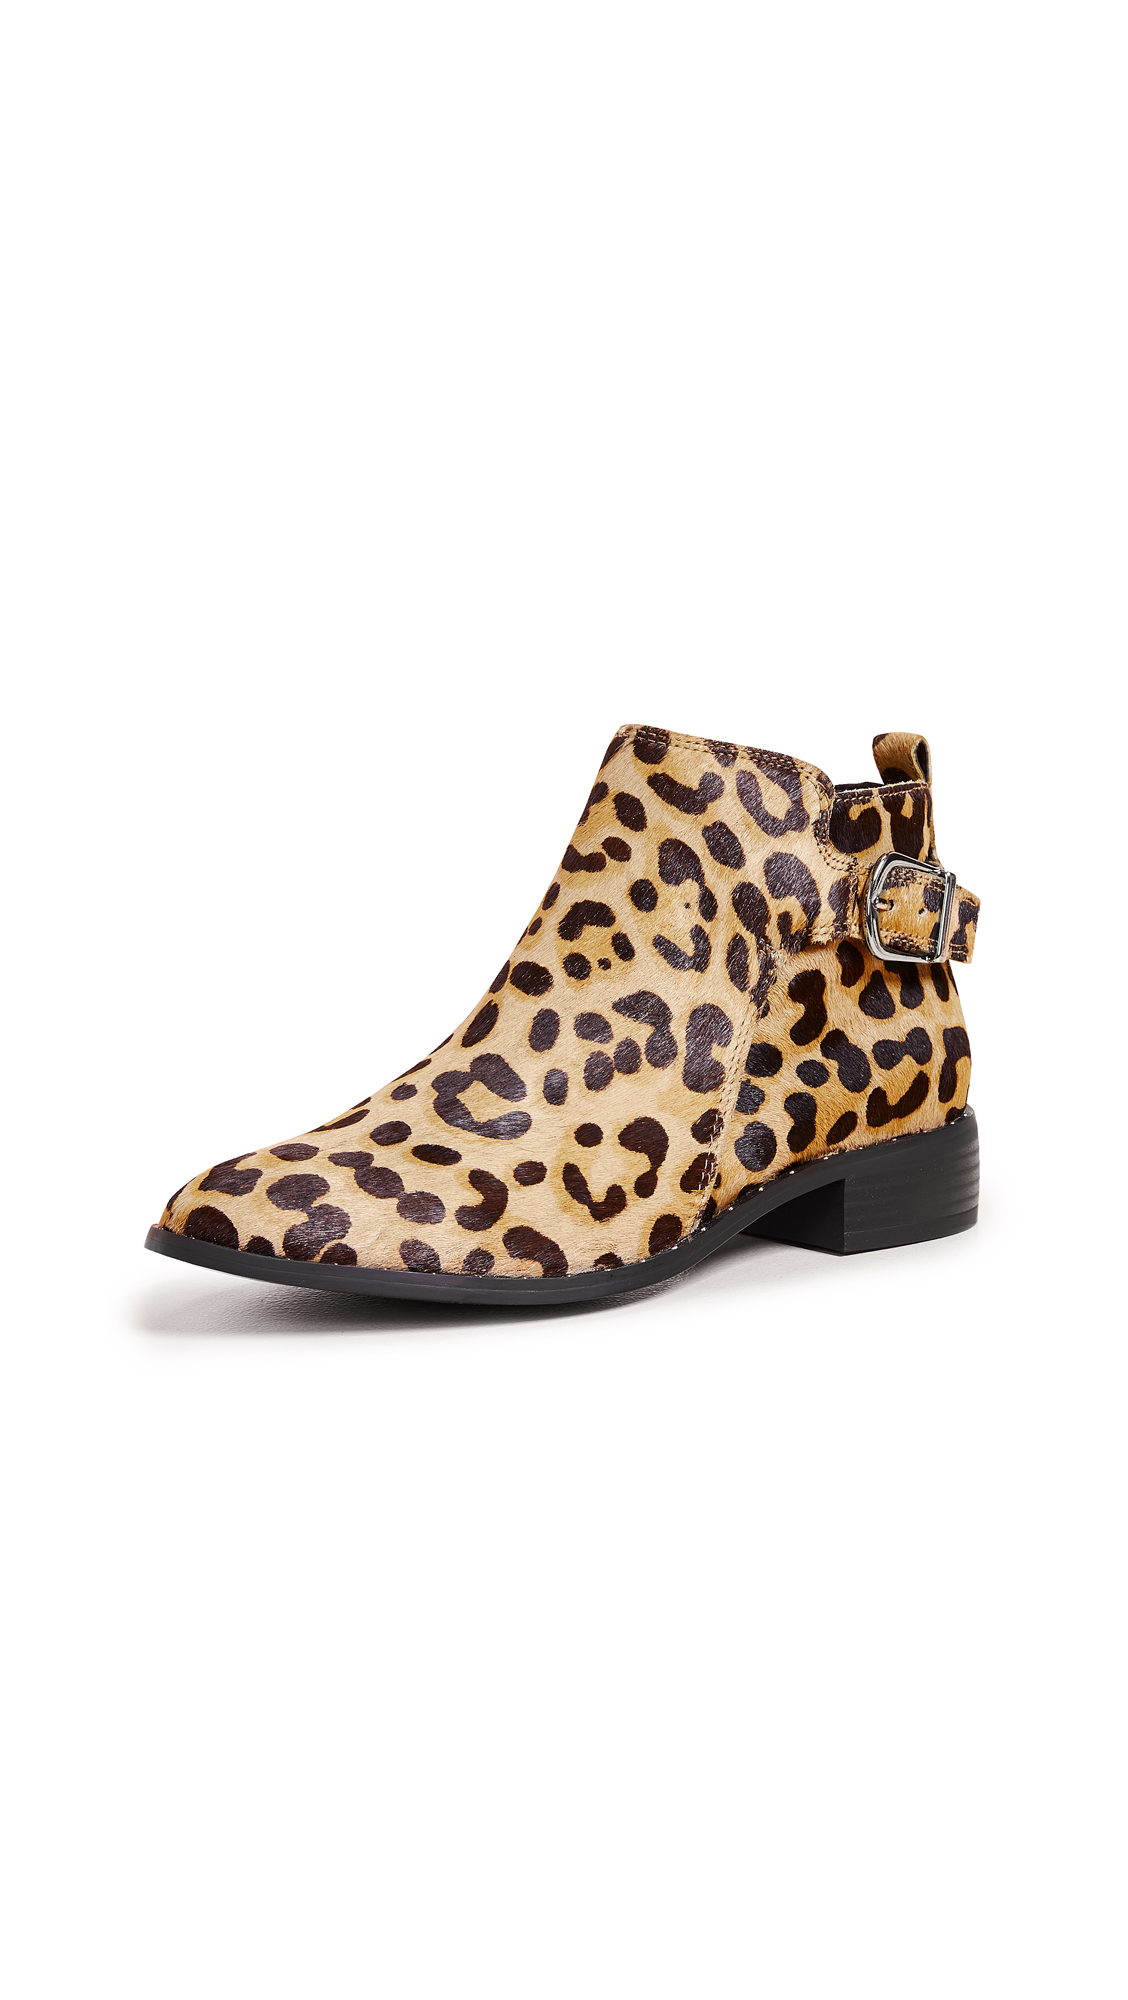 Steven Chavi Booties - Leopard